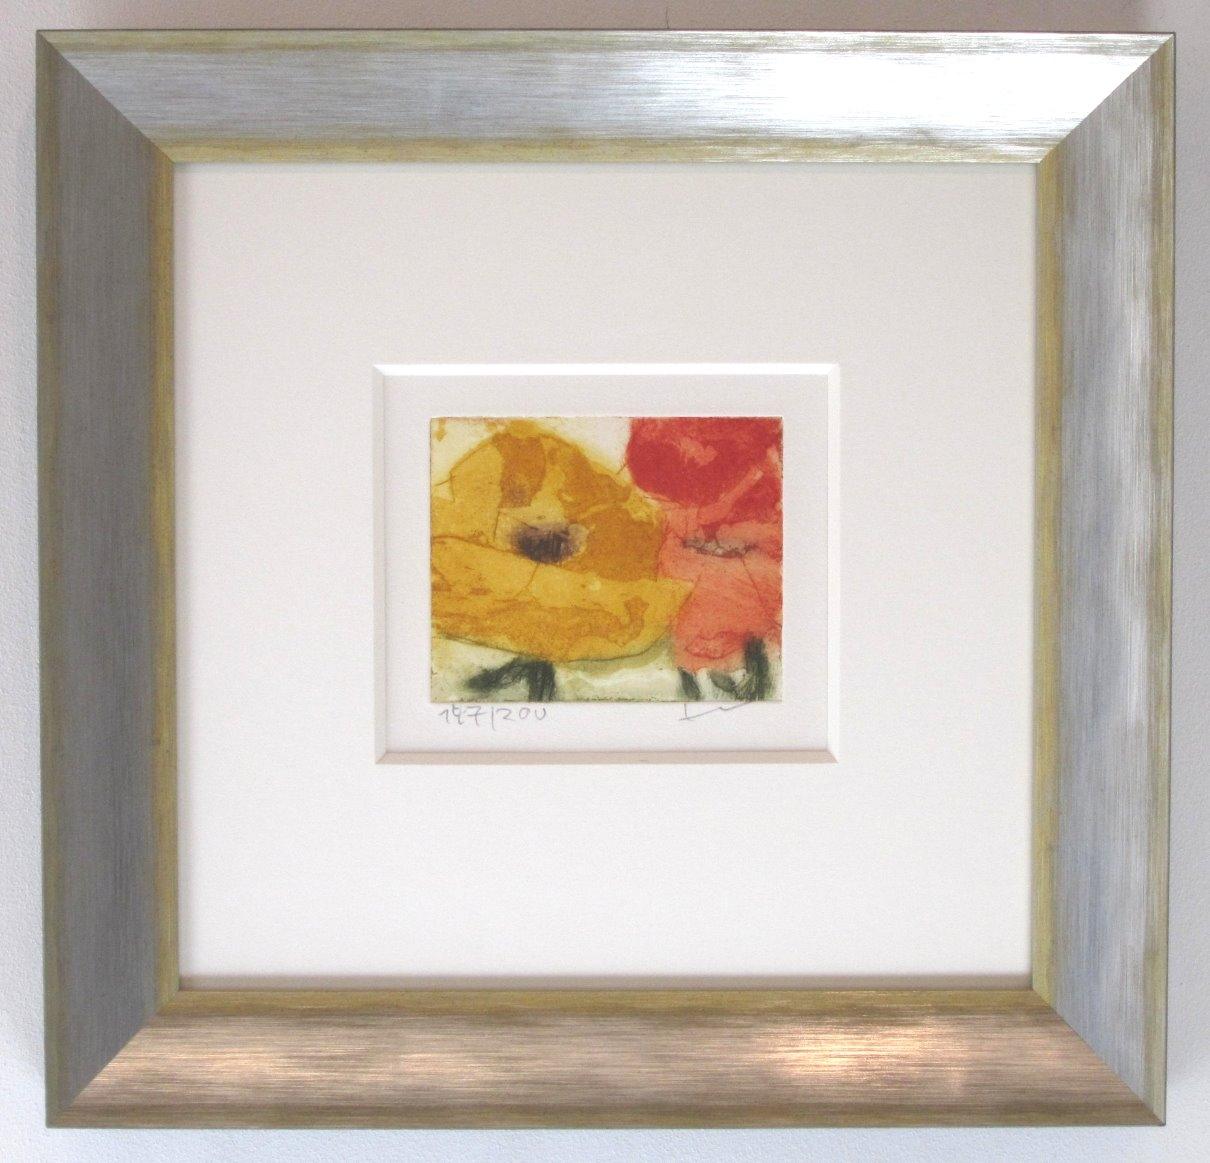 Rosen gelb/rot, gerahmt silber-gelb